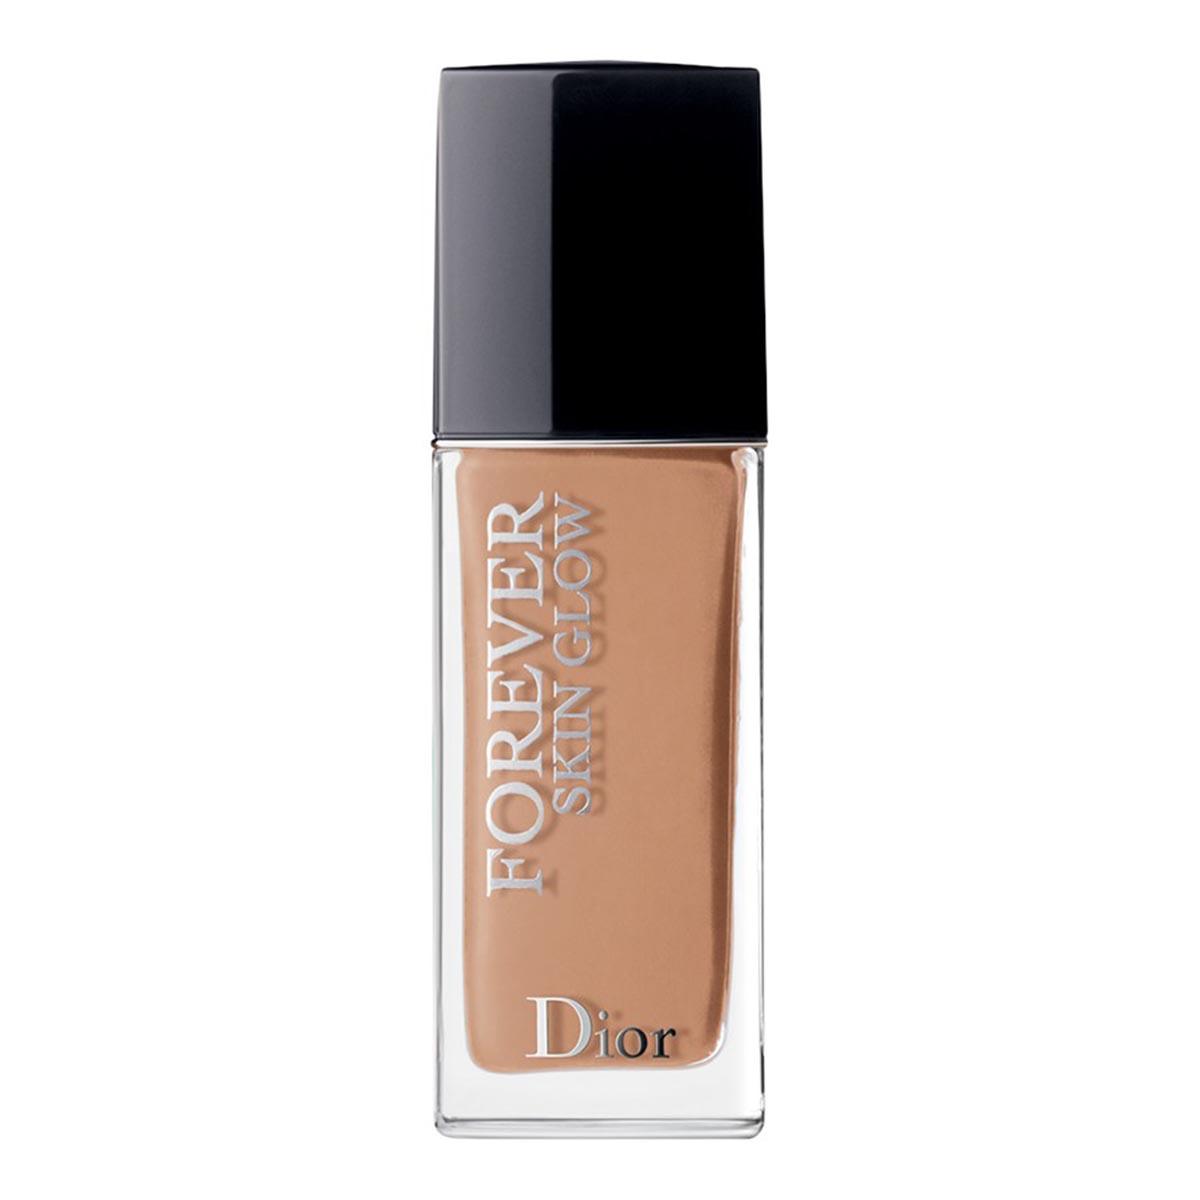 Dior diorskin forever skin glow fond de teint 4 5n